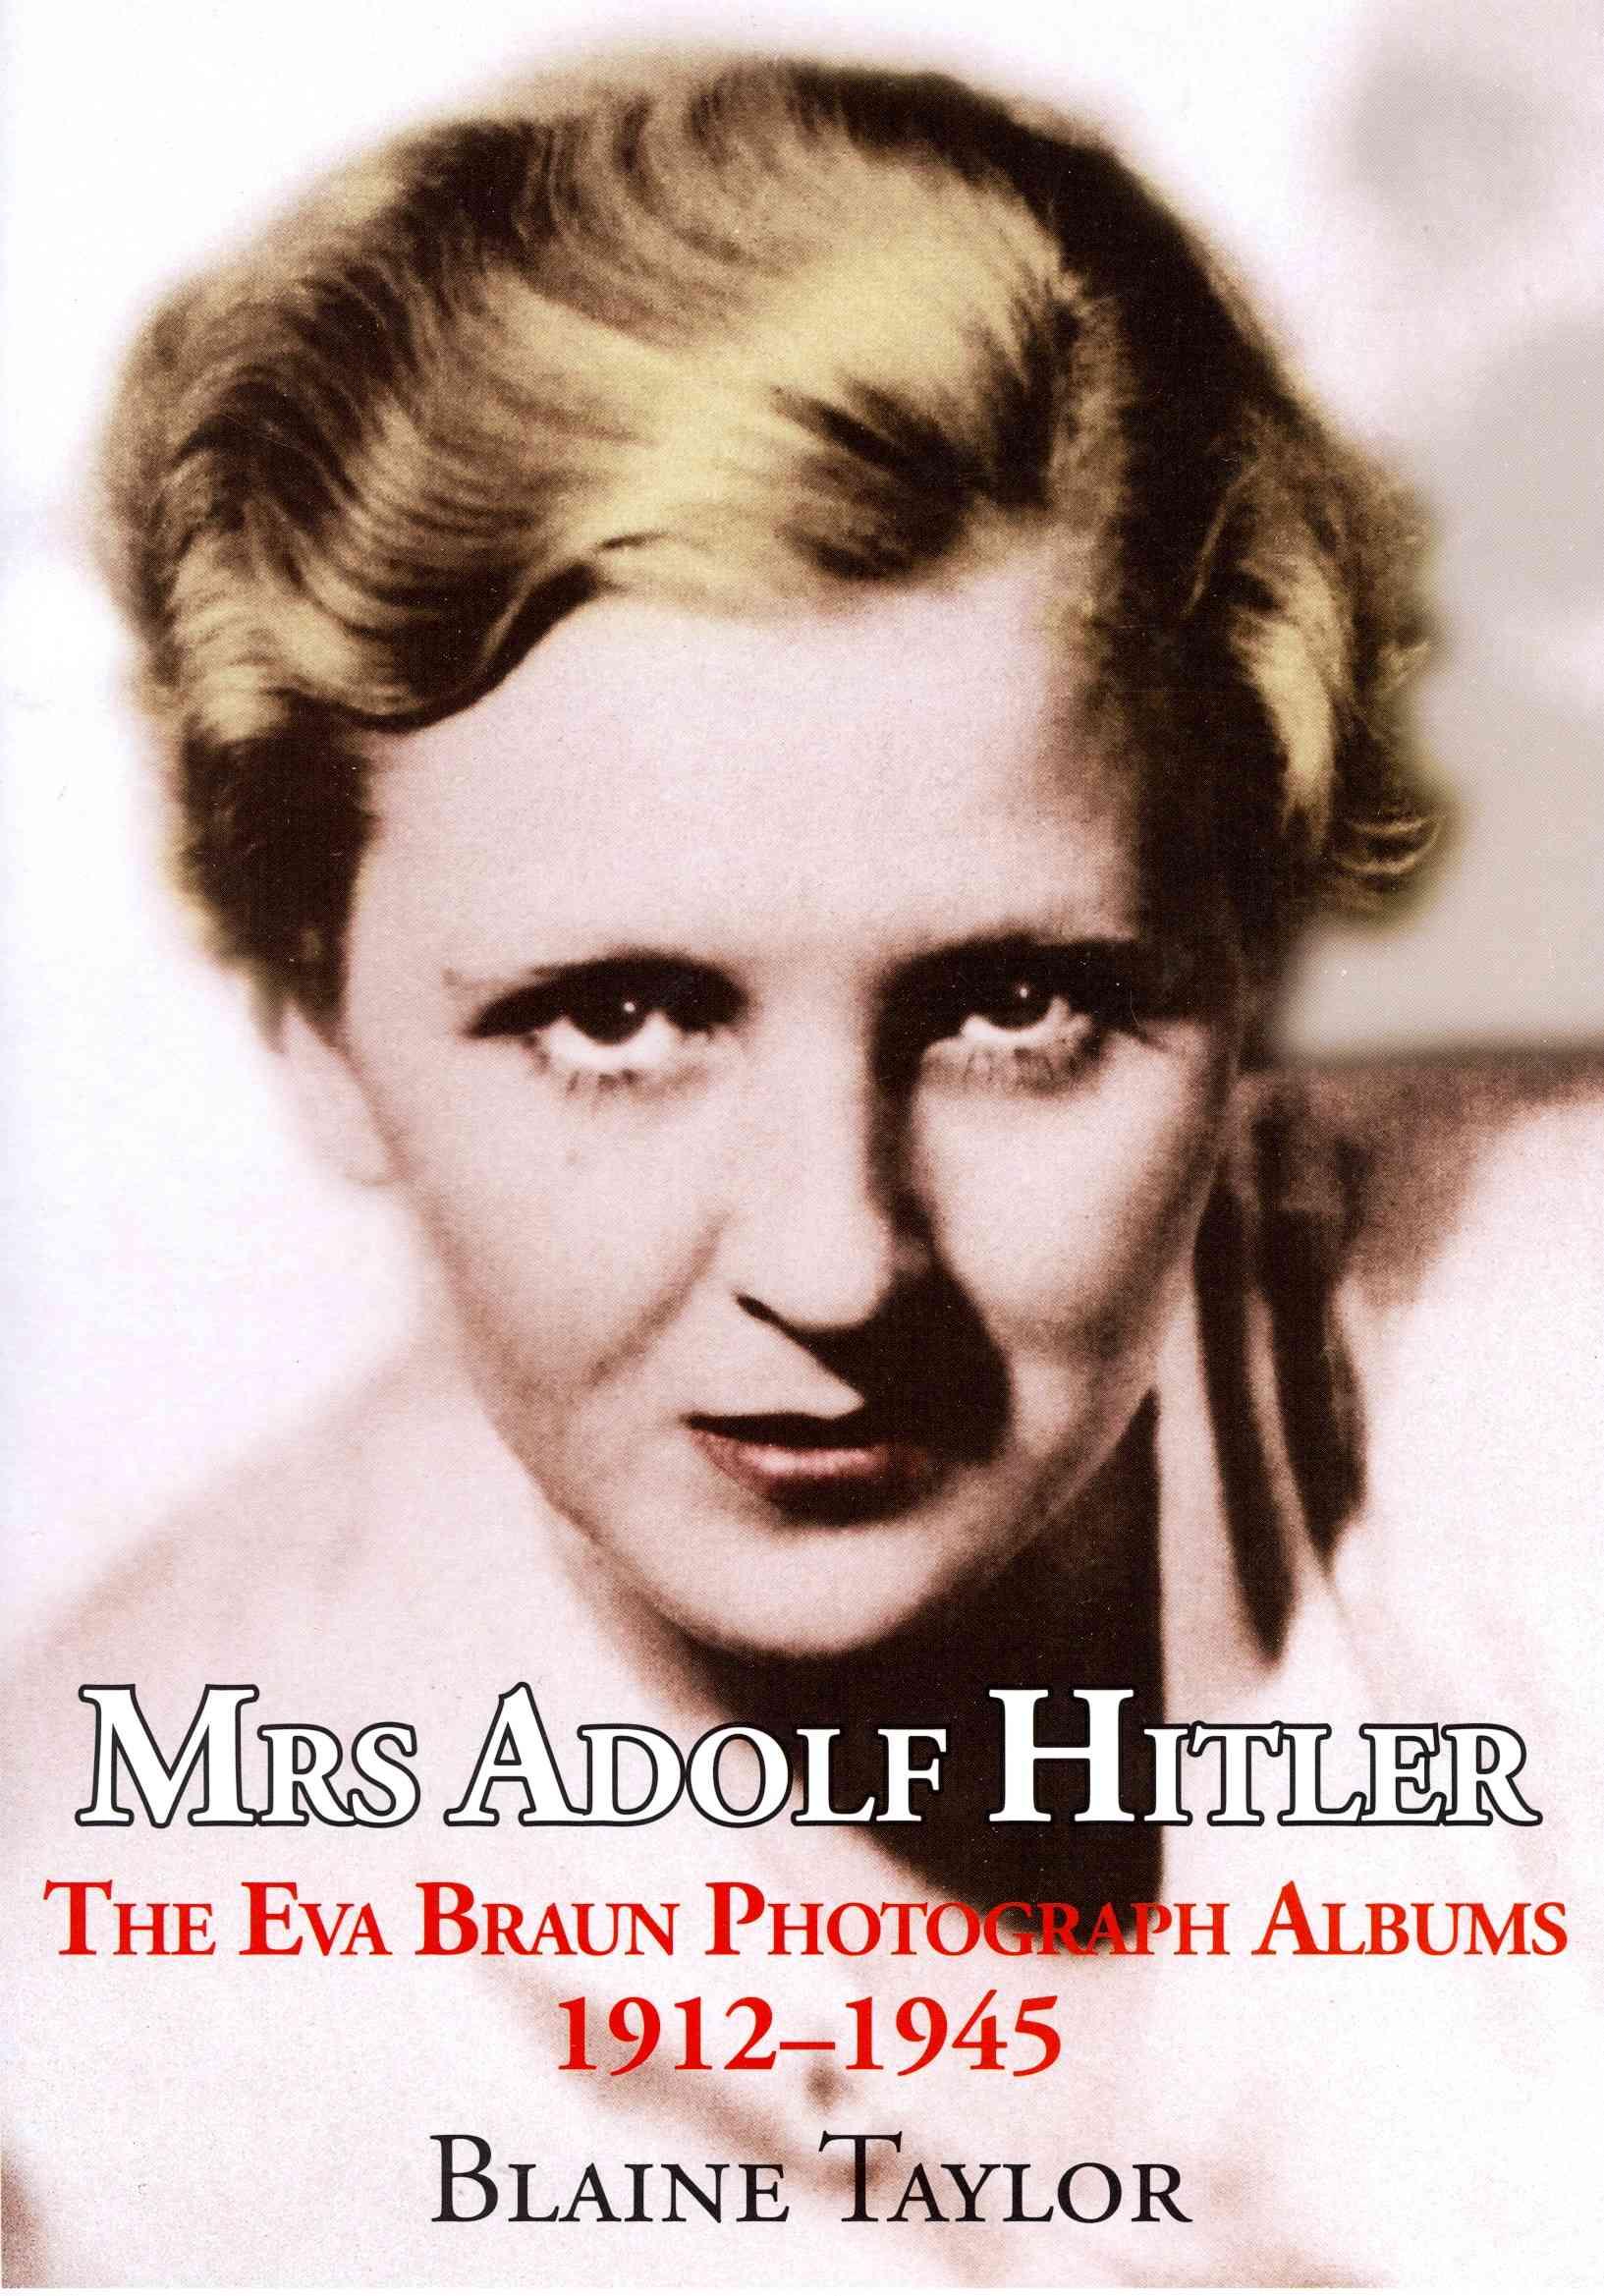 Mrs. Adolf Hitler: The Eva Braun Photograph Albums 1912-45 (Hardcover)